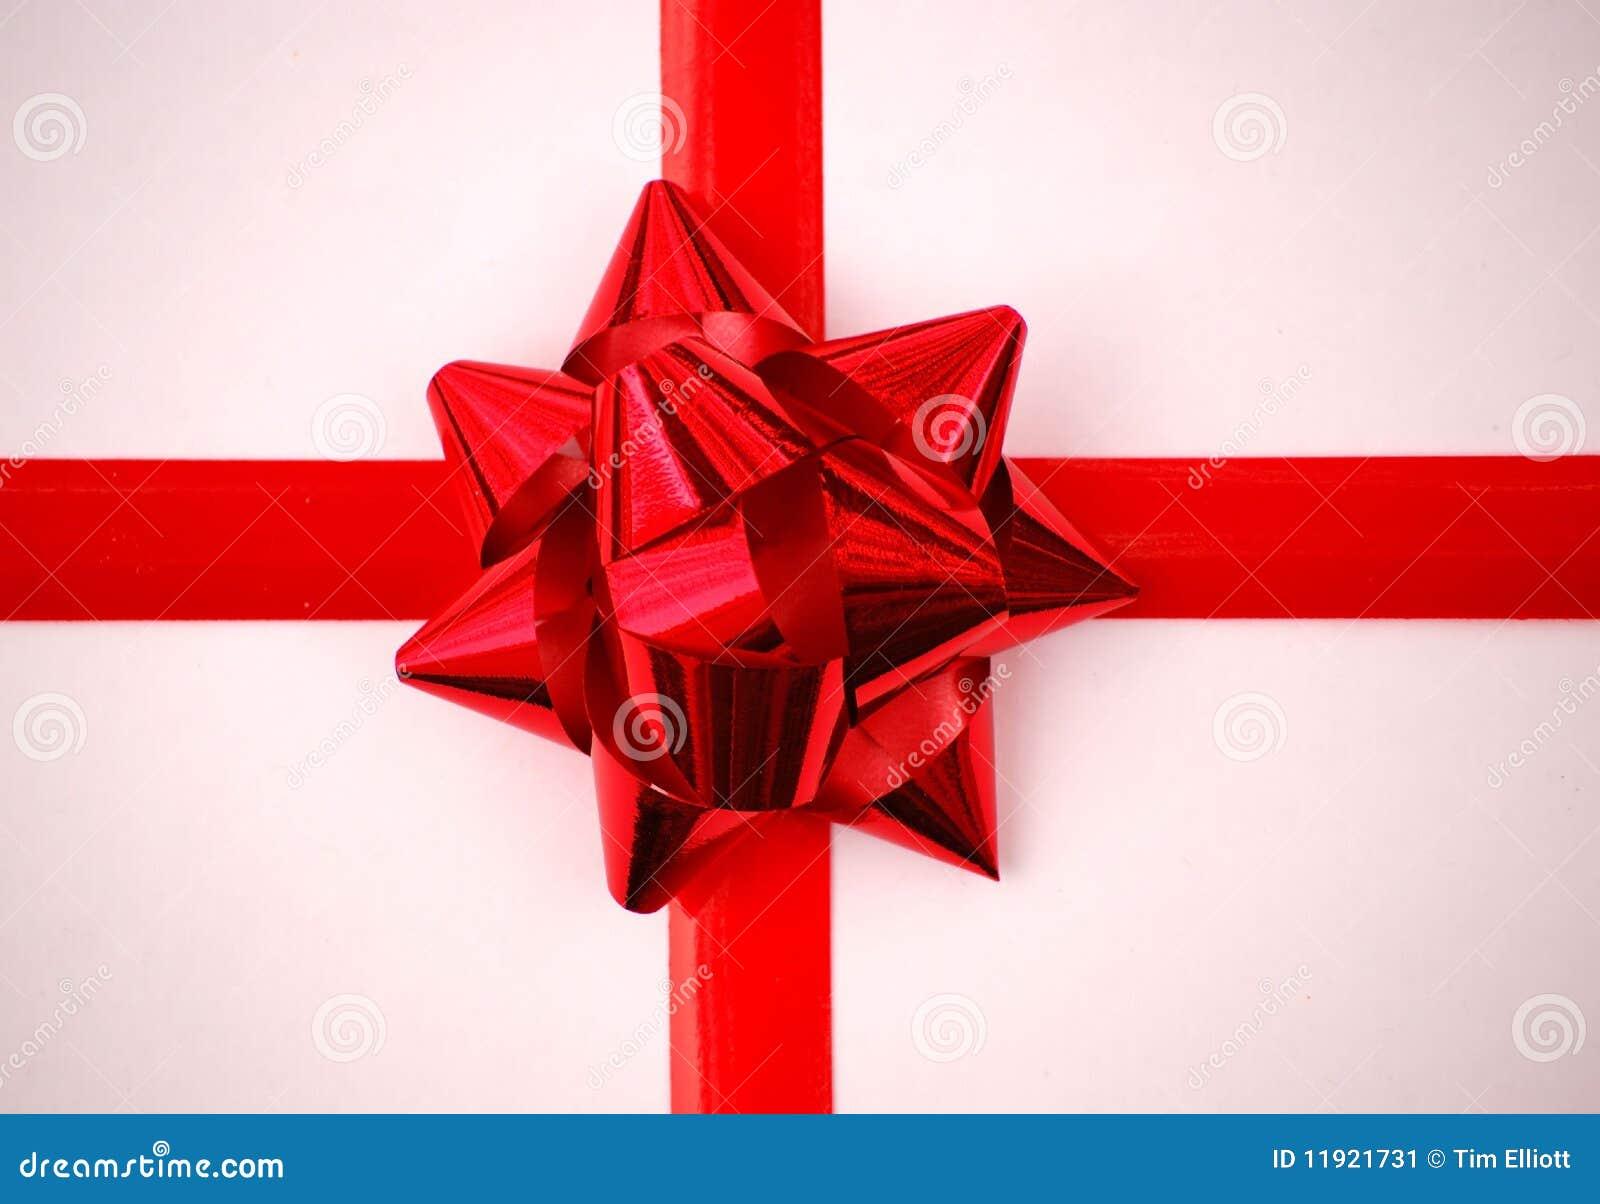 weihnachtsgeschenk verpackung stockbild bild 11921731. Black Bedroom Furniture Sets. Home Design Ideas